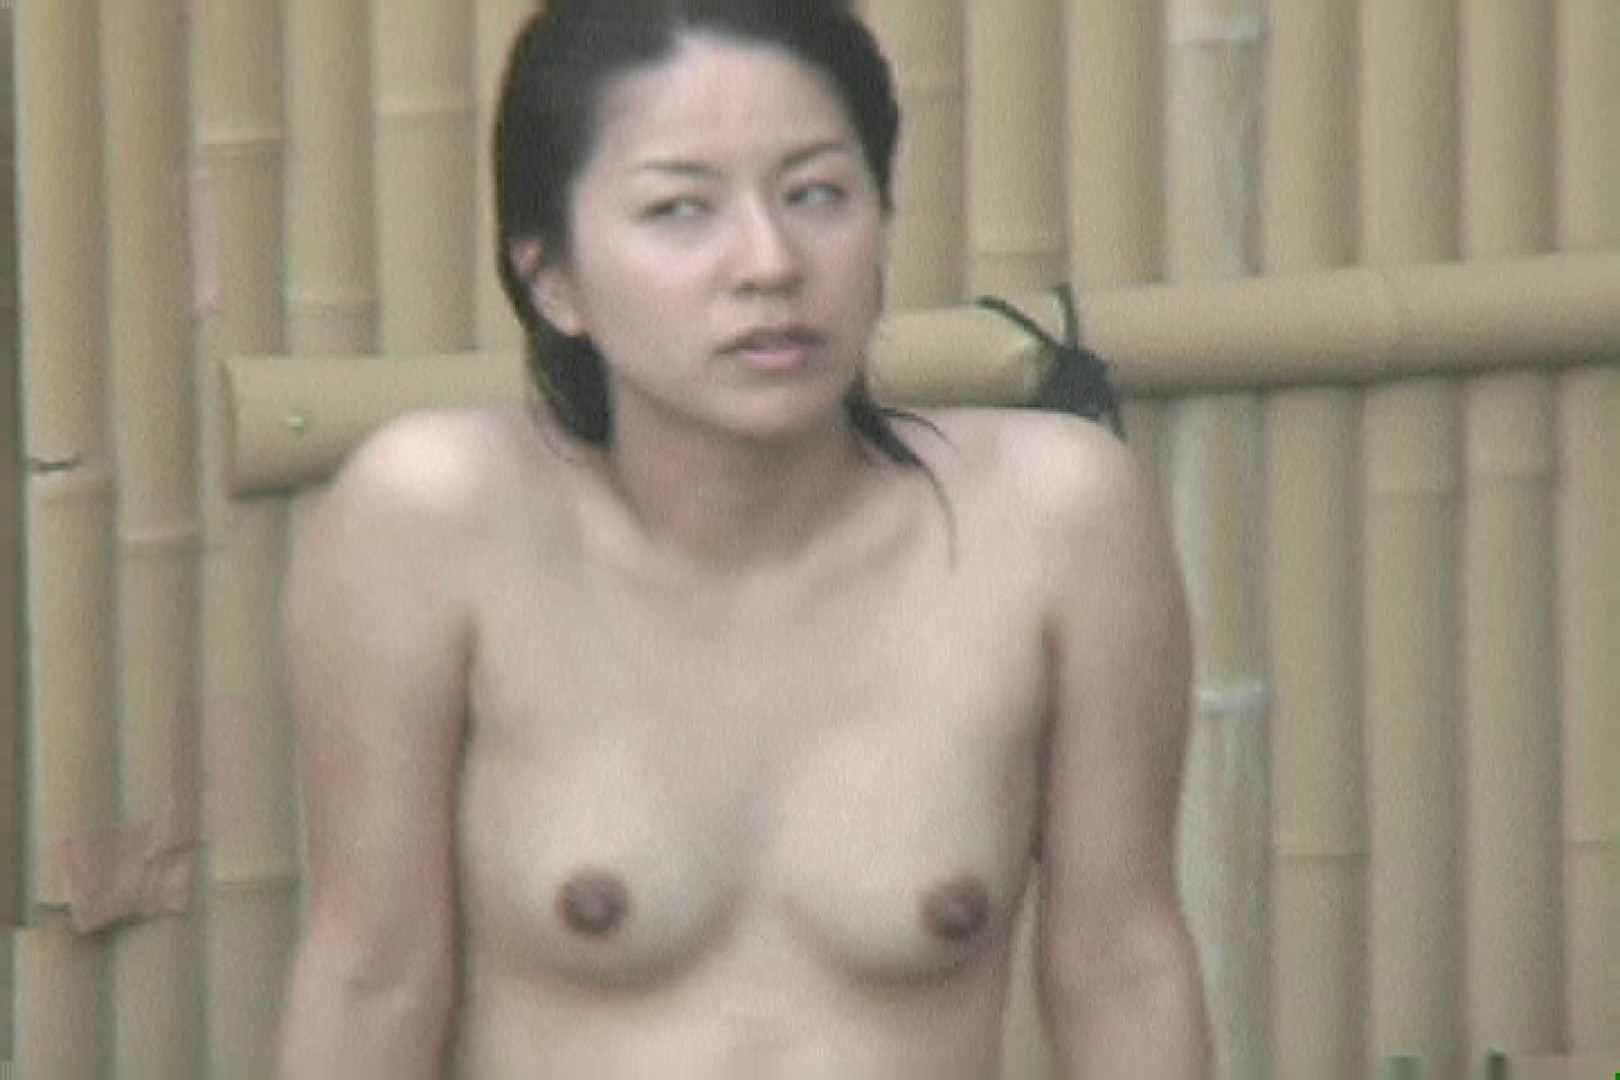 Aquaな露天風呂Vol.694 露天 オメコ無修正動画無料 110PICs 68